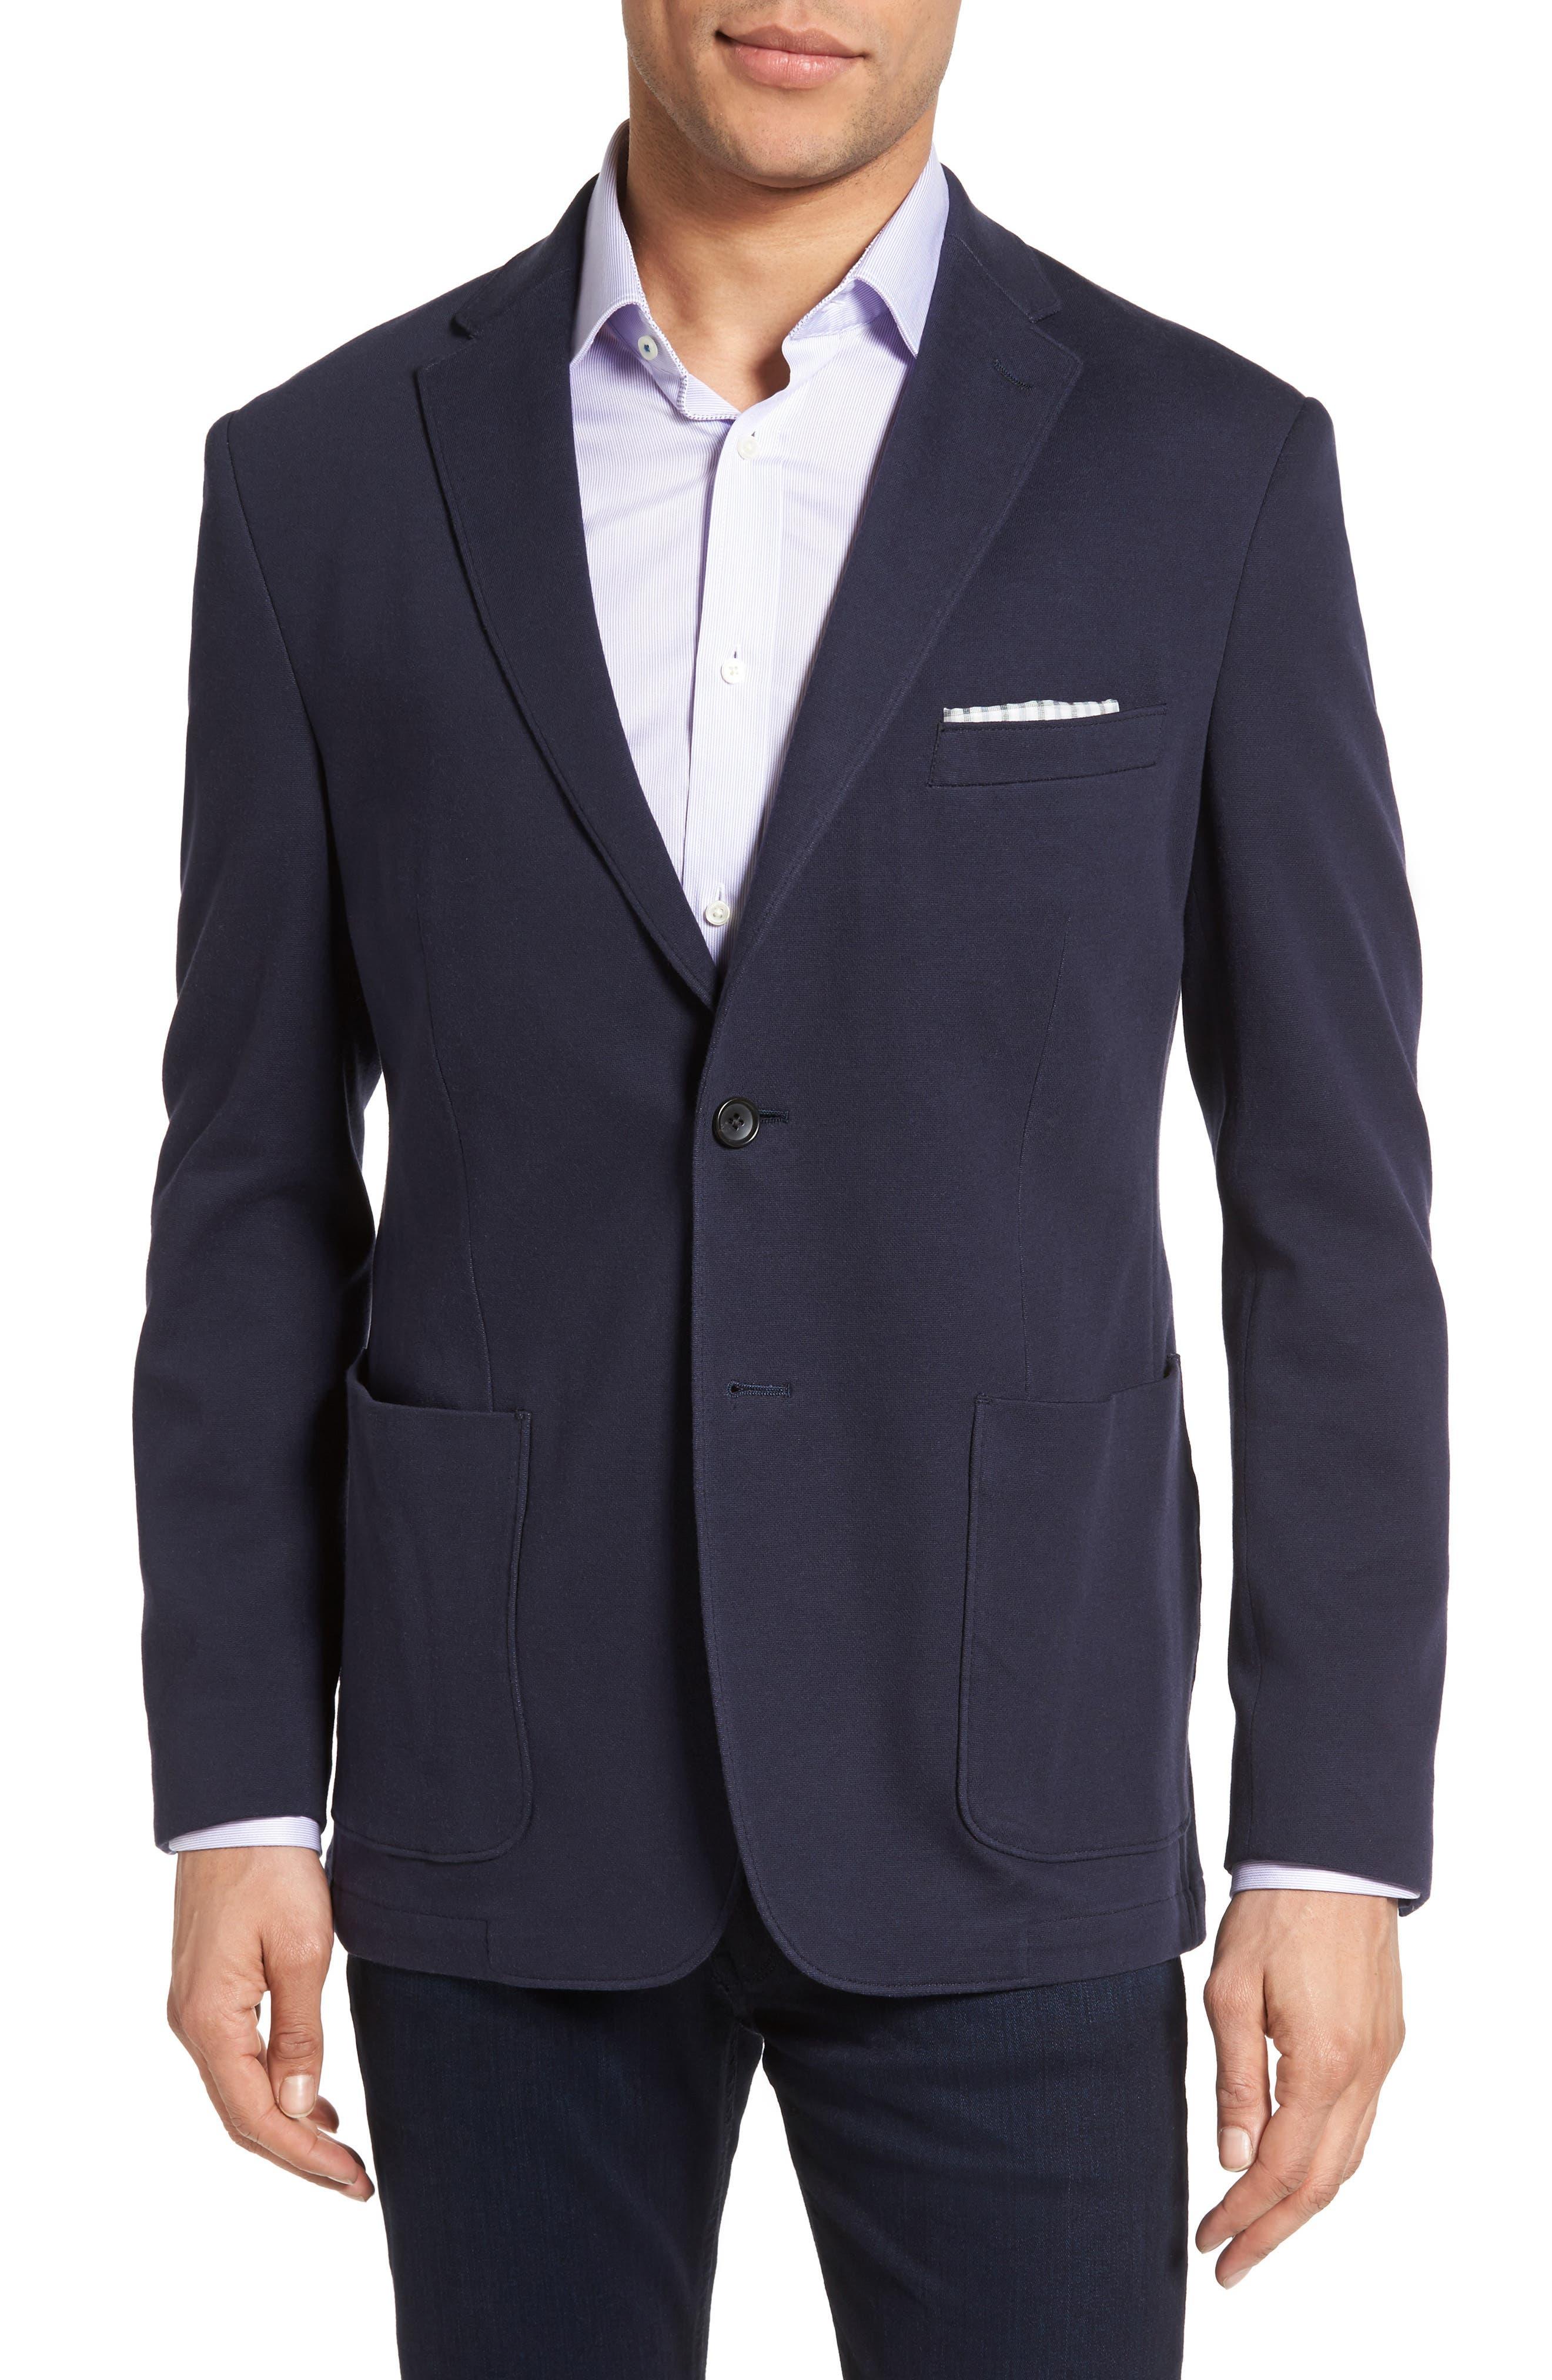 BENSOL Jersey Sport Coat